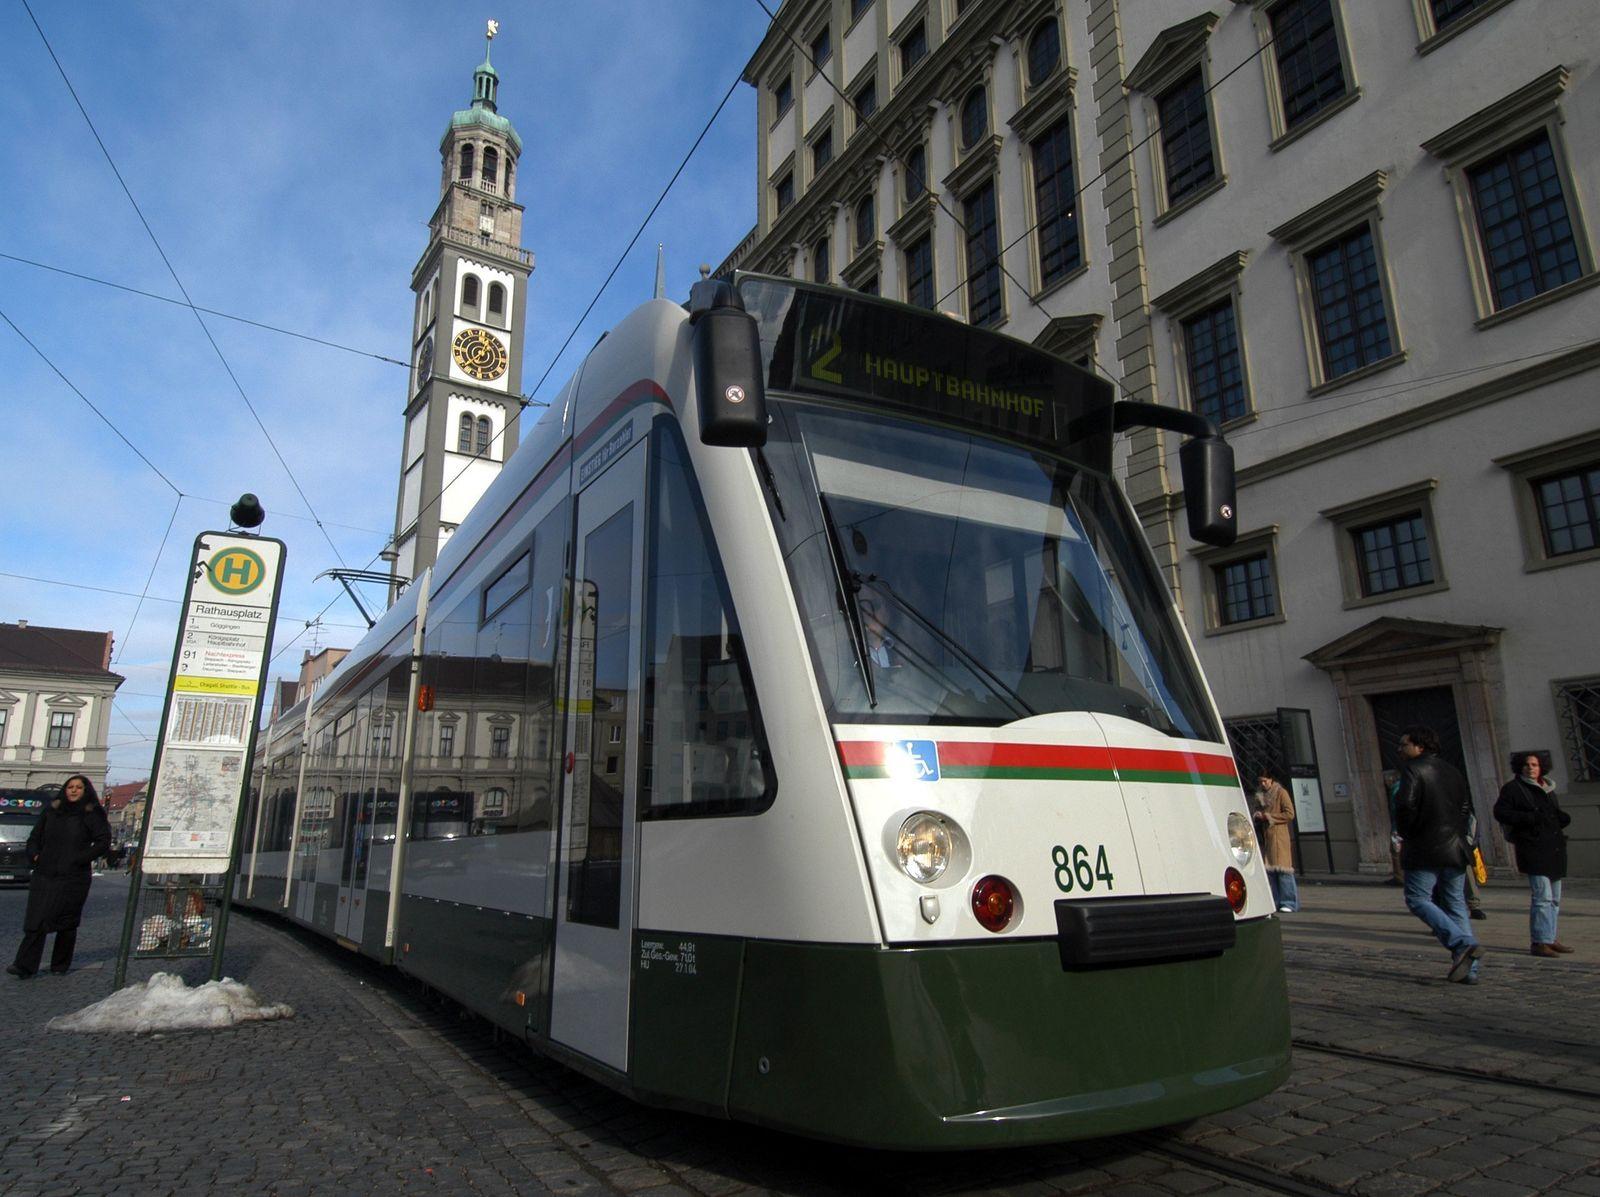 Straßenbahn Augsburg